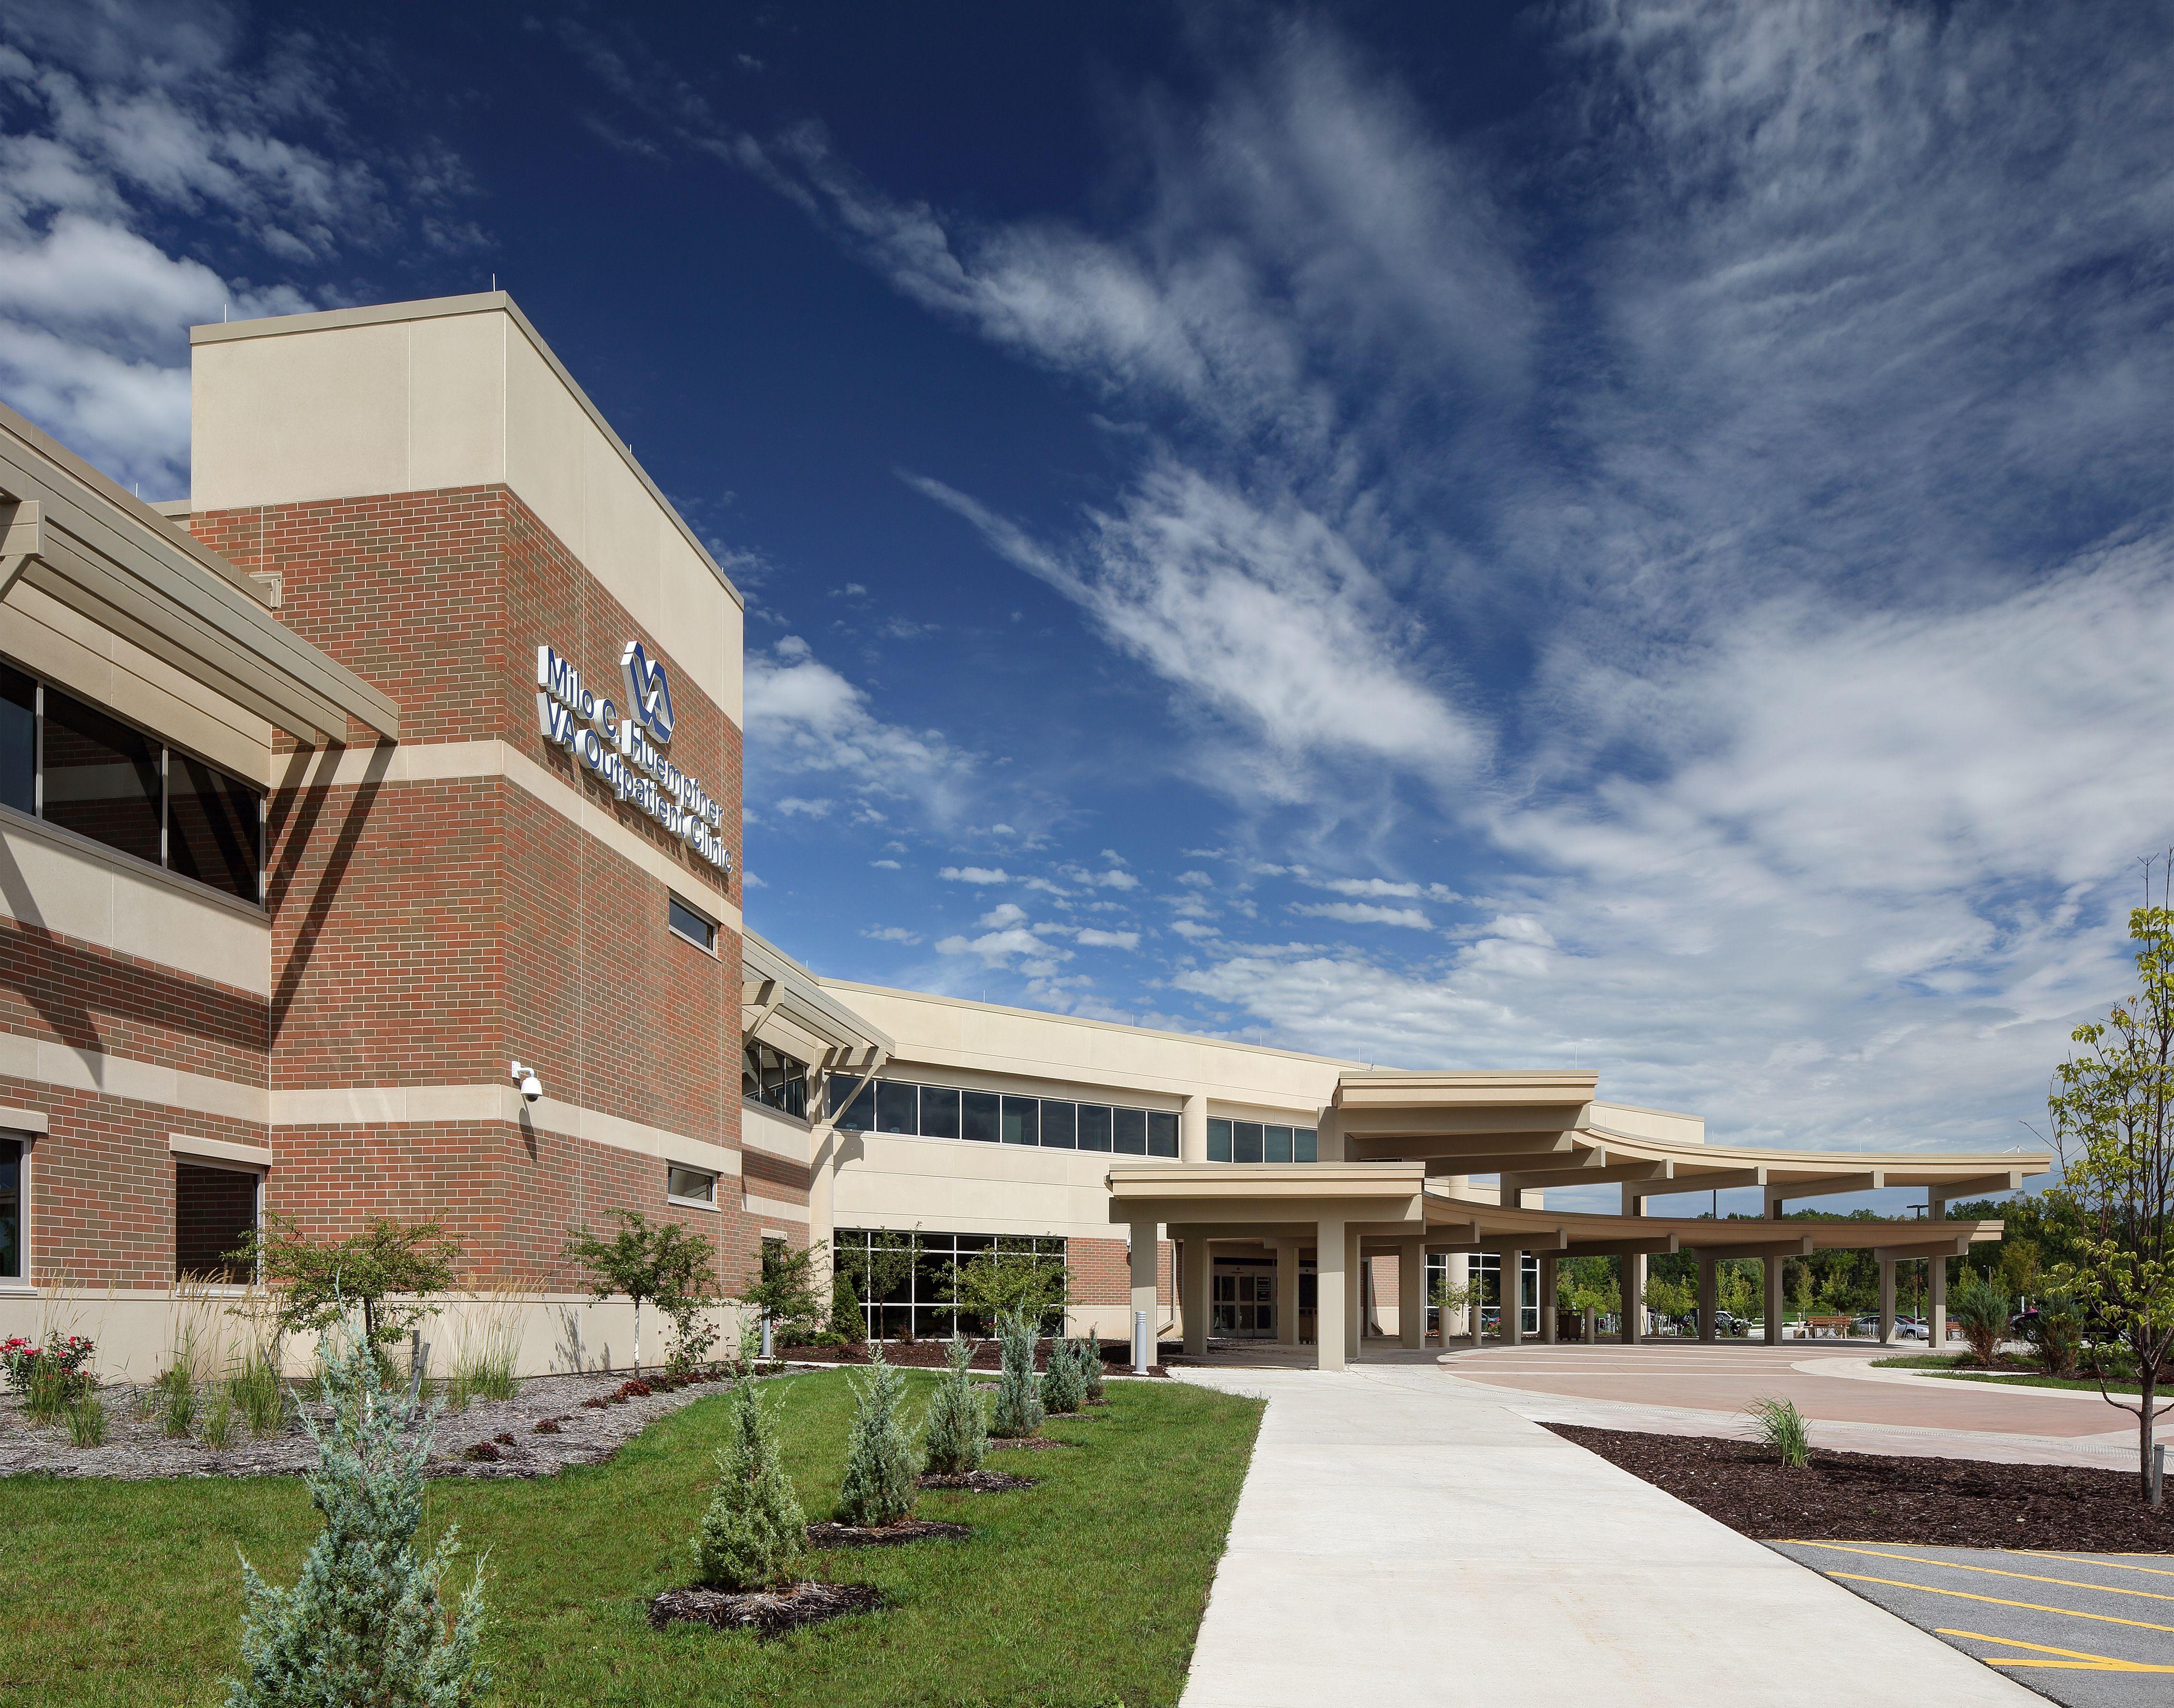 17++ Community health center of lubbock texas trends